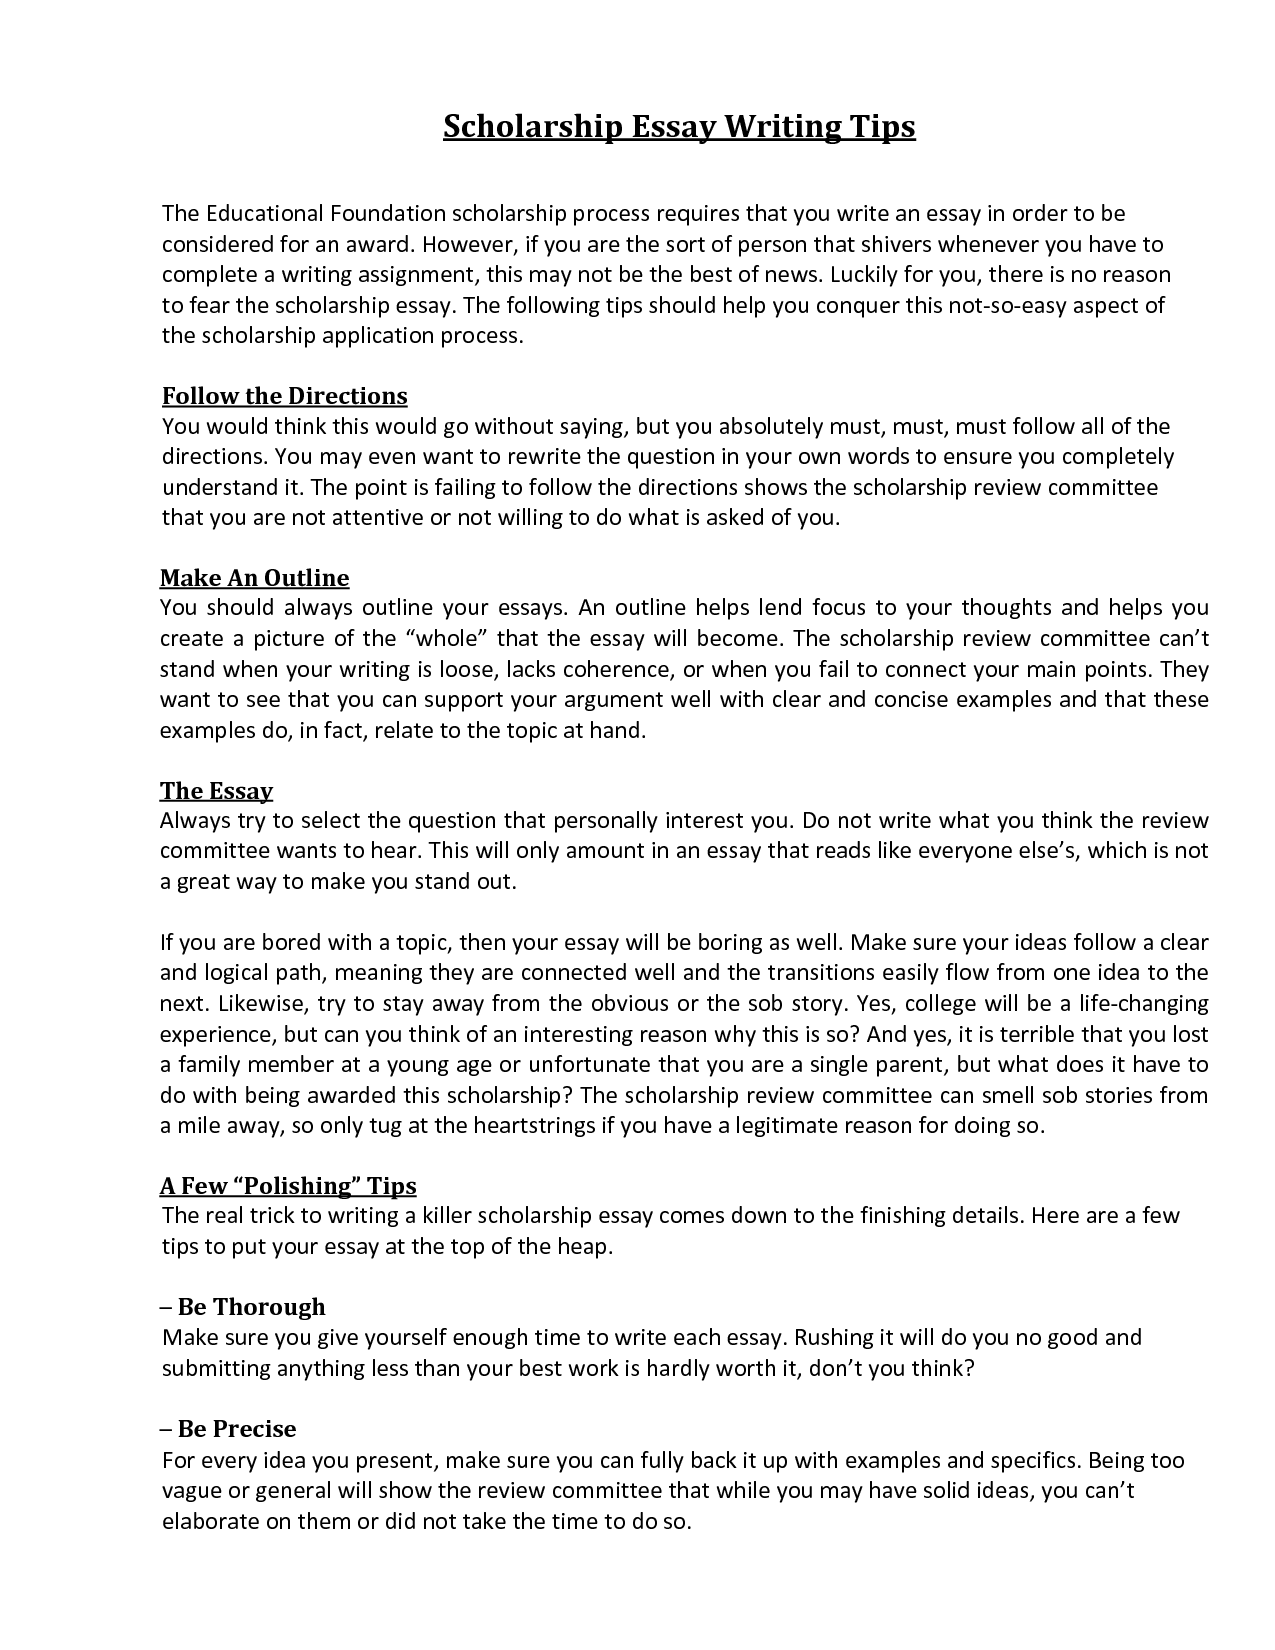 003 Example Scholarships Ziolxujgwq Phenomenal Scholarship Essays Sample For Masters 500 Words Nursing Full